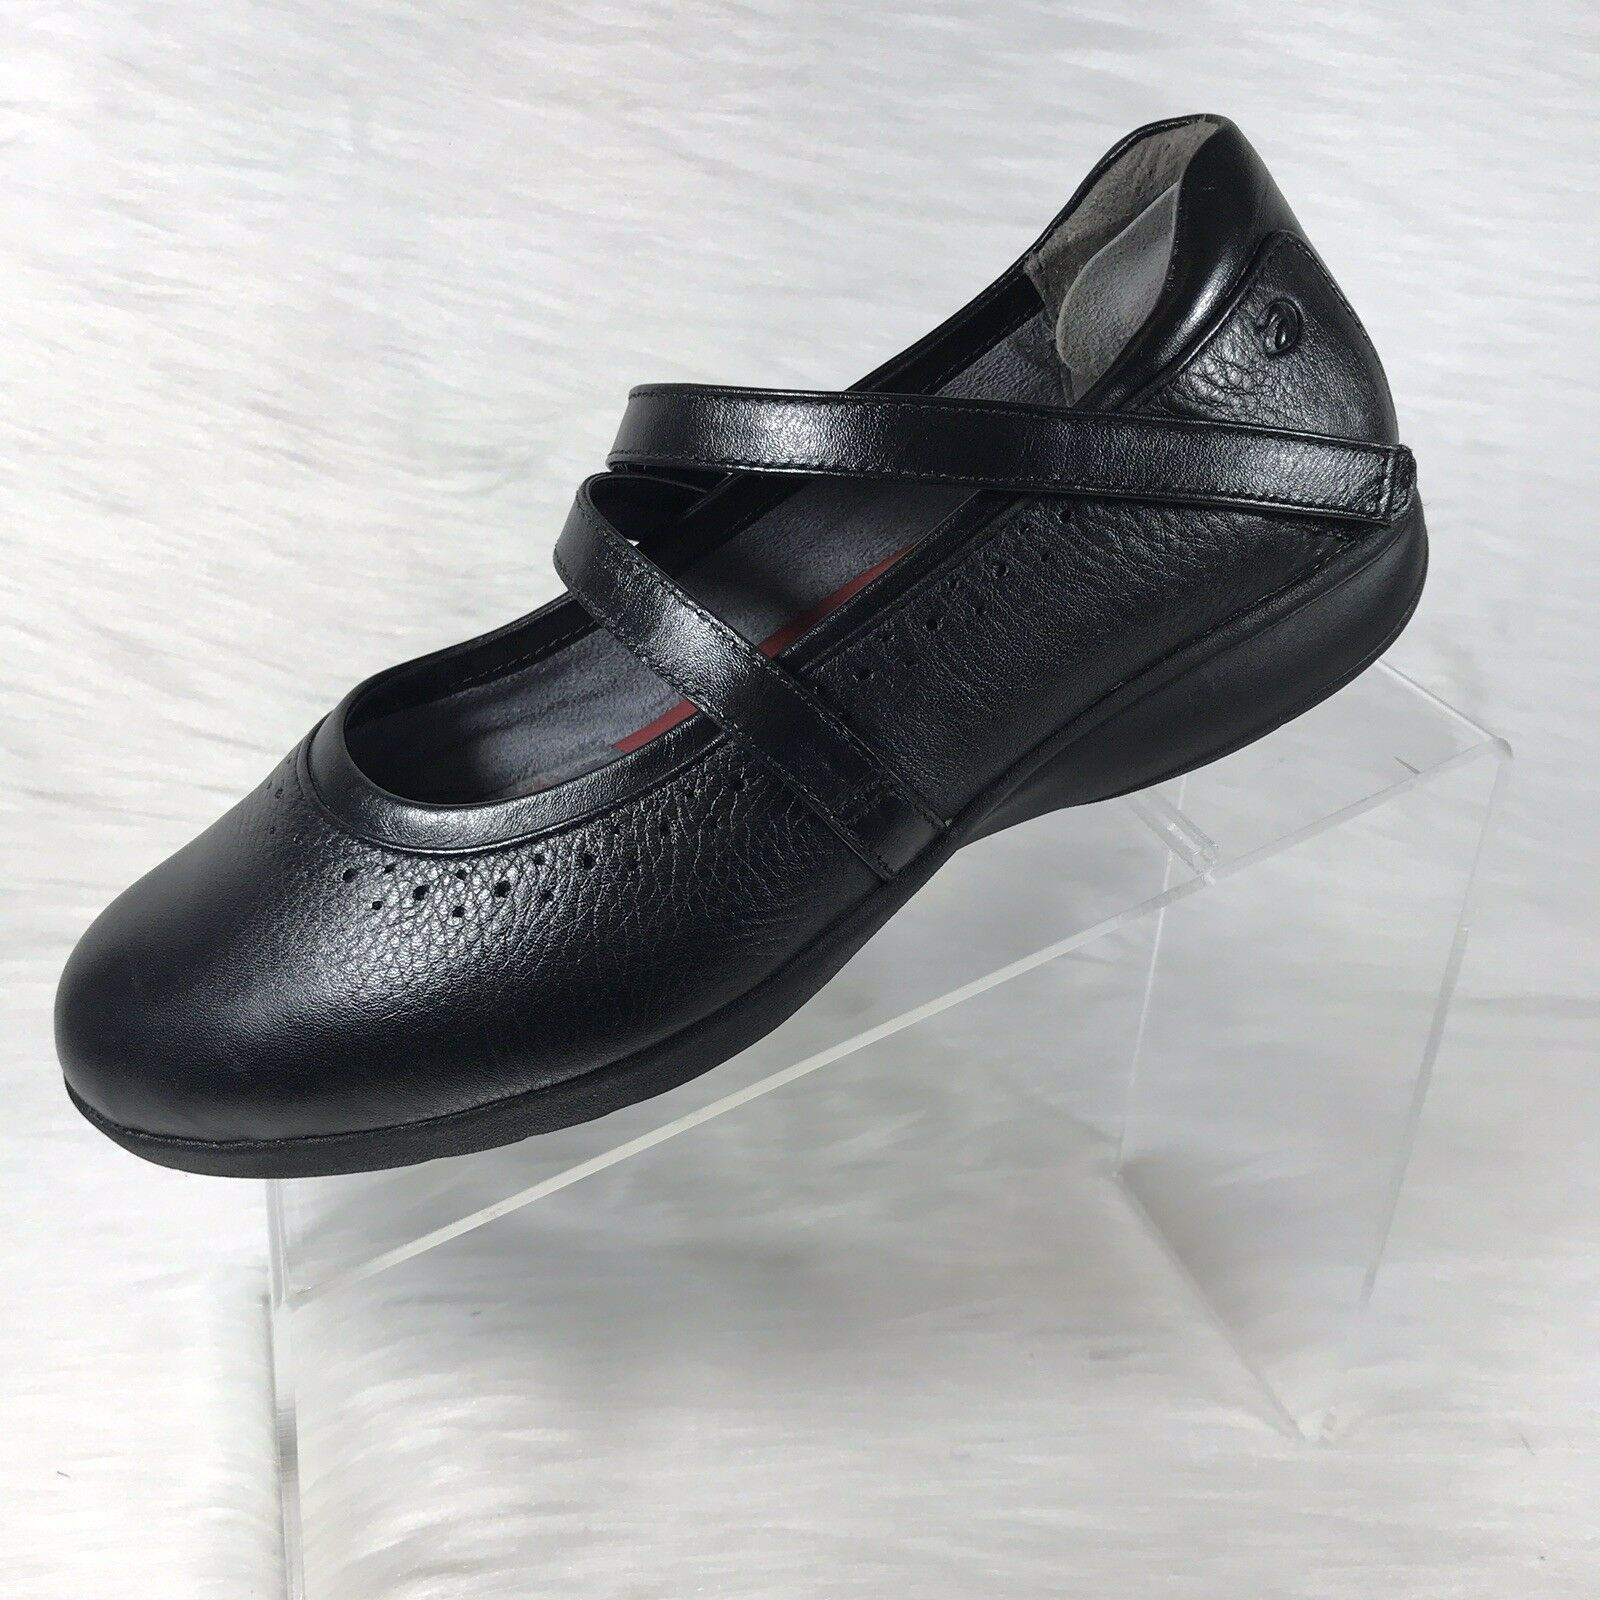 Aravon By New Balance Women's Mary Jane shoes Black Leather Size 9 B